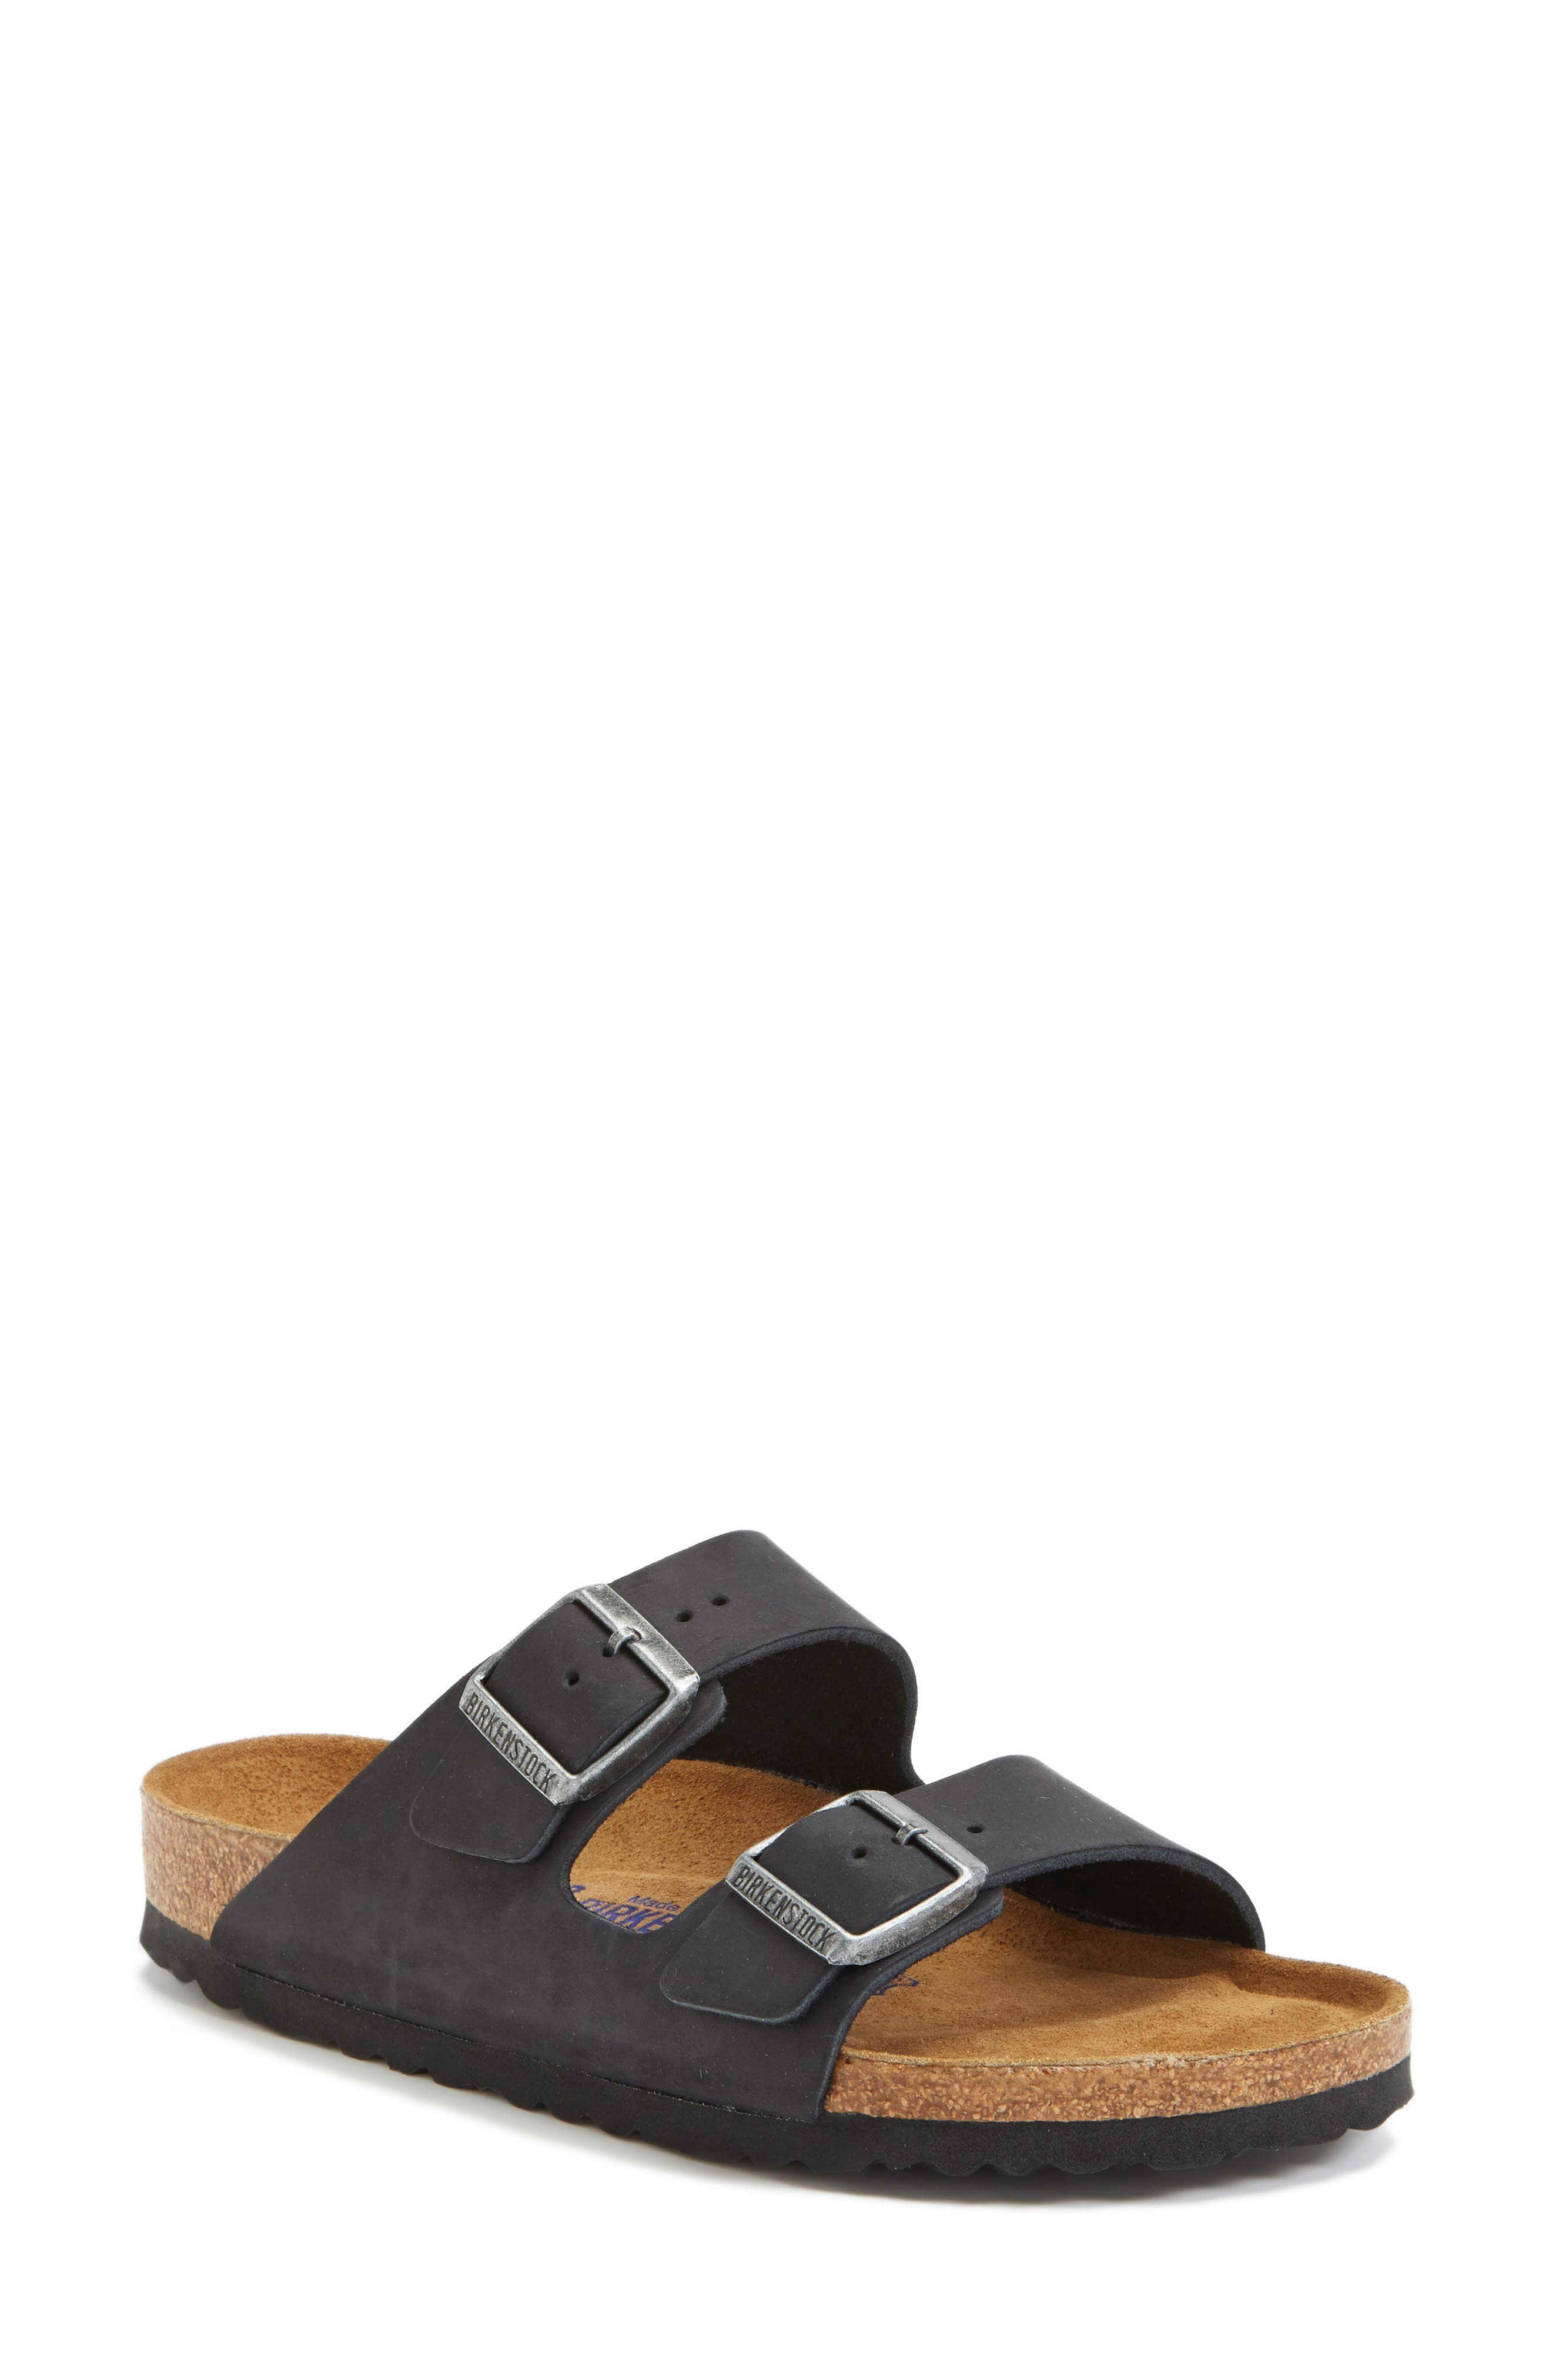 'Arizona' Soft Footbed Sandal,                             Main thumbnail 1, color,                             Black/ Black